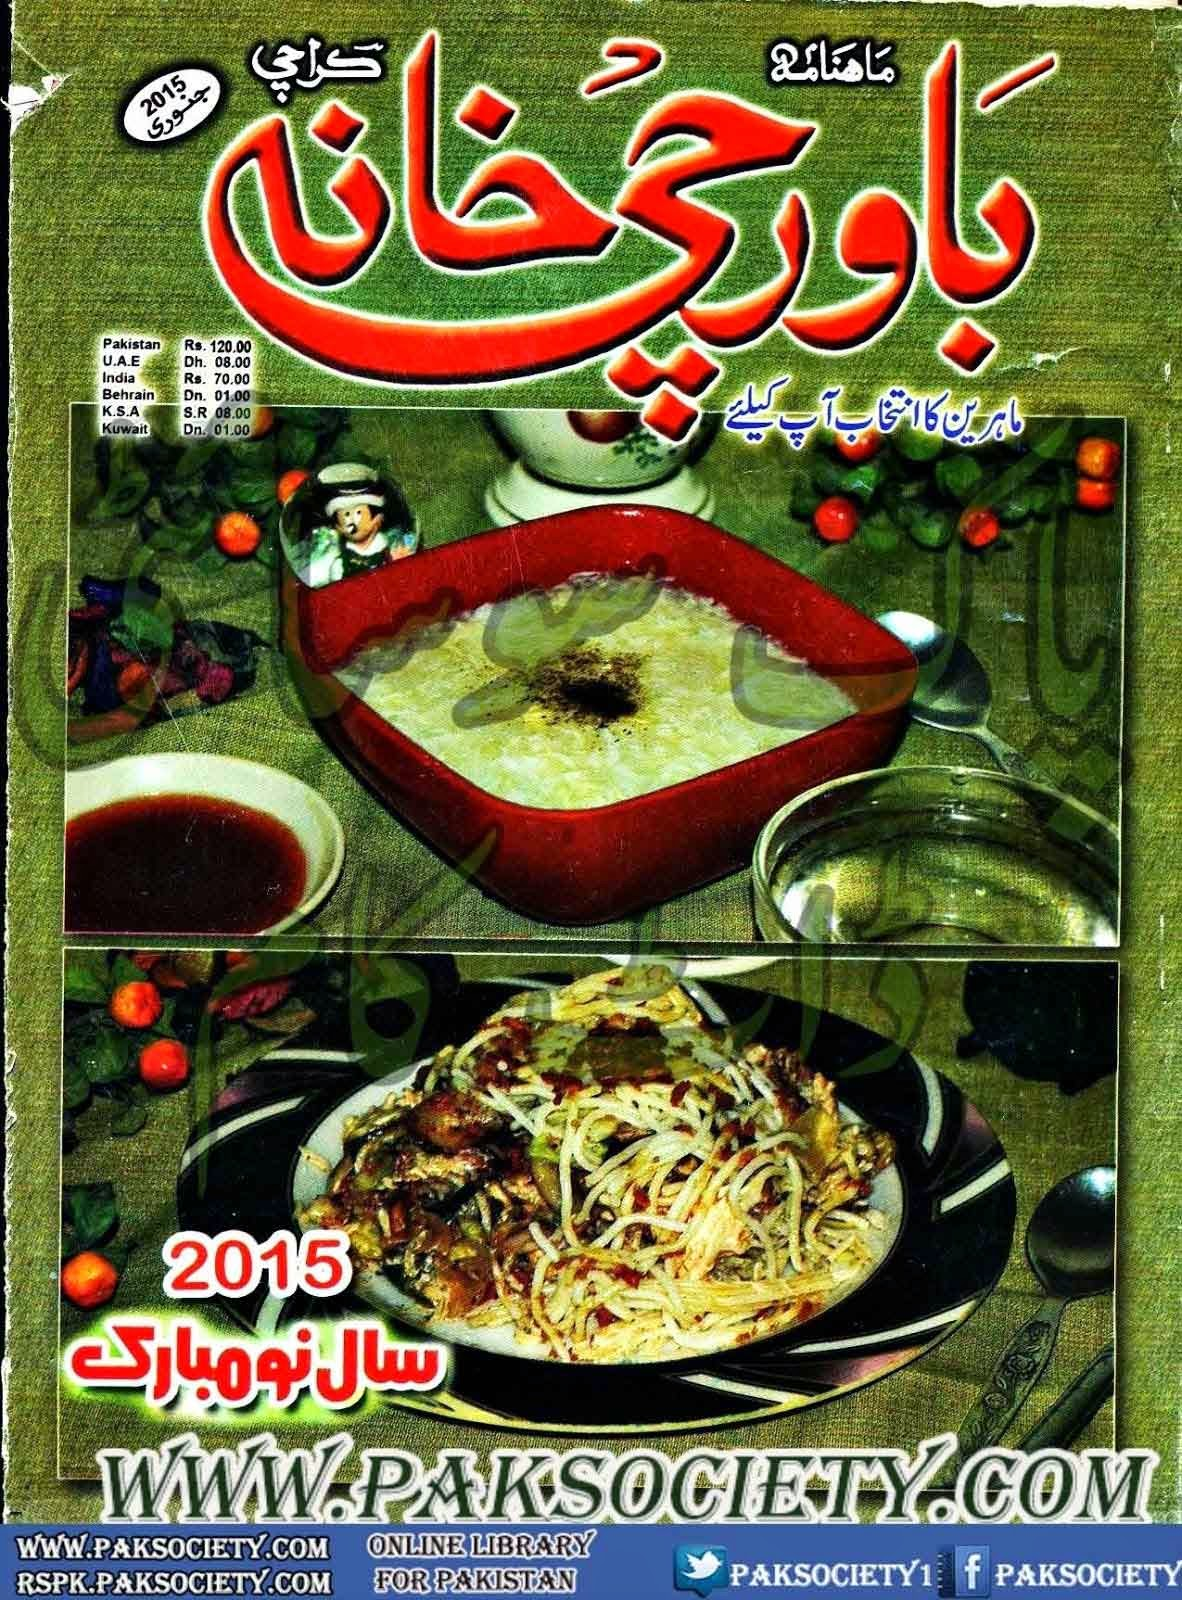 Bawarchi Khana Magazine January 2015